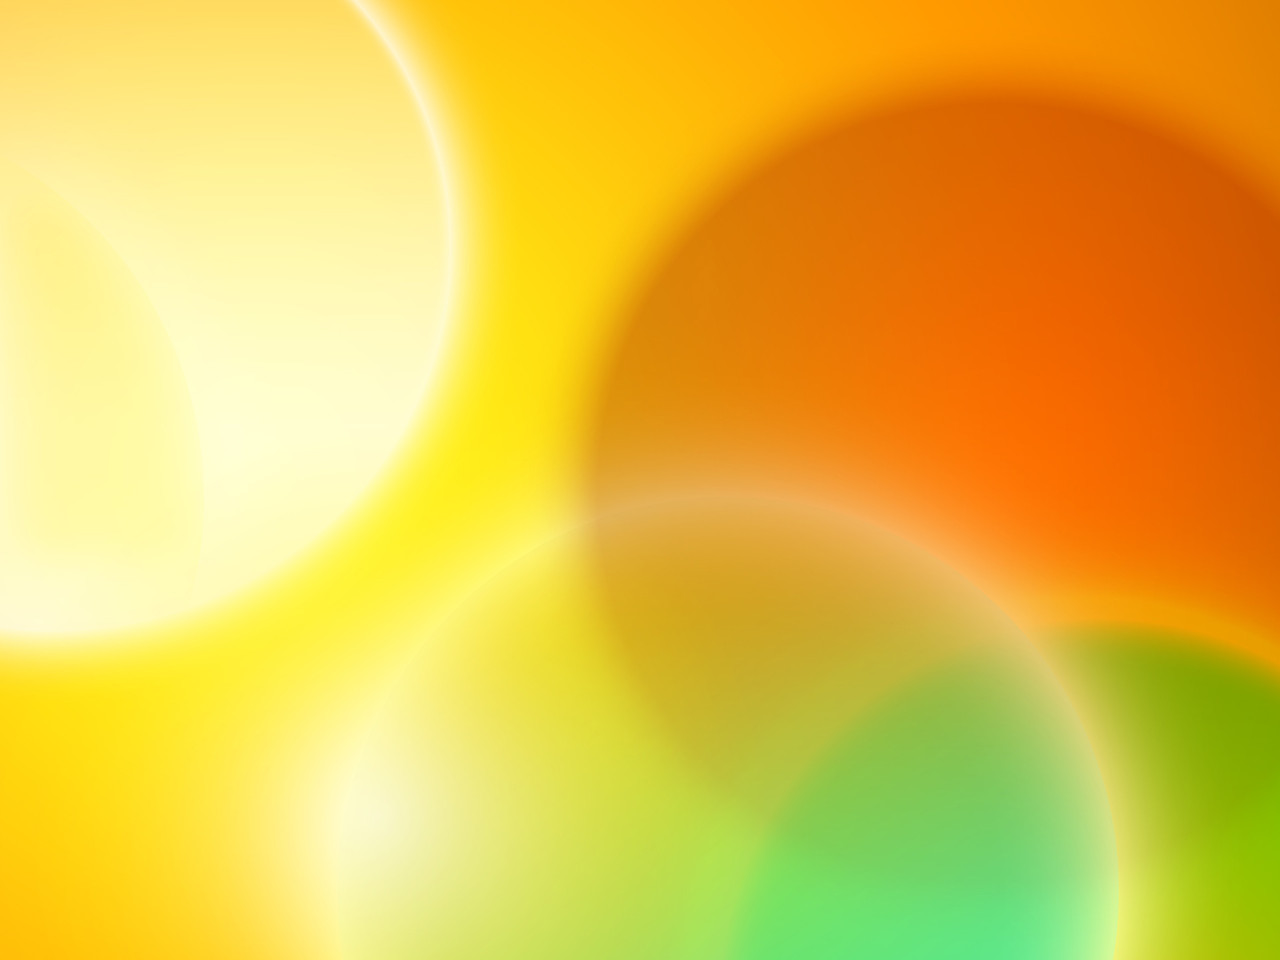 http://4.bp.blogspot.com/__bf6ZucOoBA/TJ7dhsbtm-I/AAAAAAAAAfQ/bRrHZnugy5o/s1600/windows-7-wallpaper-14.jpg